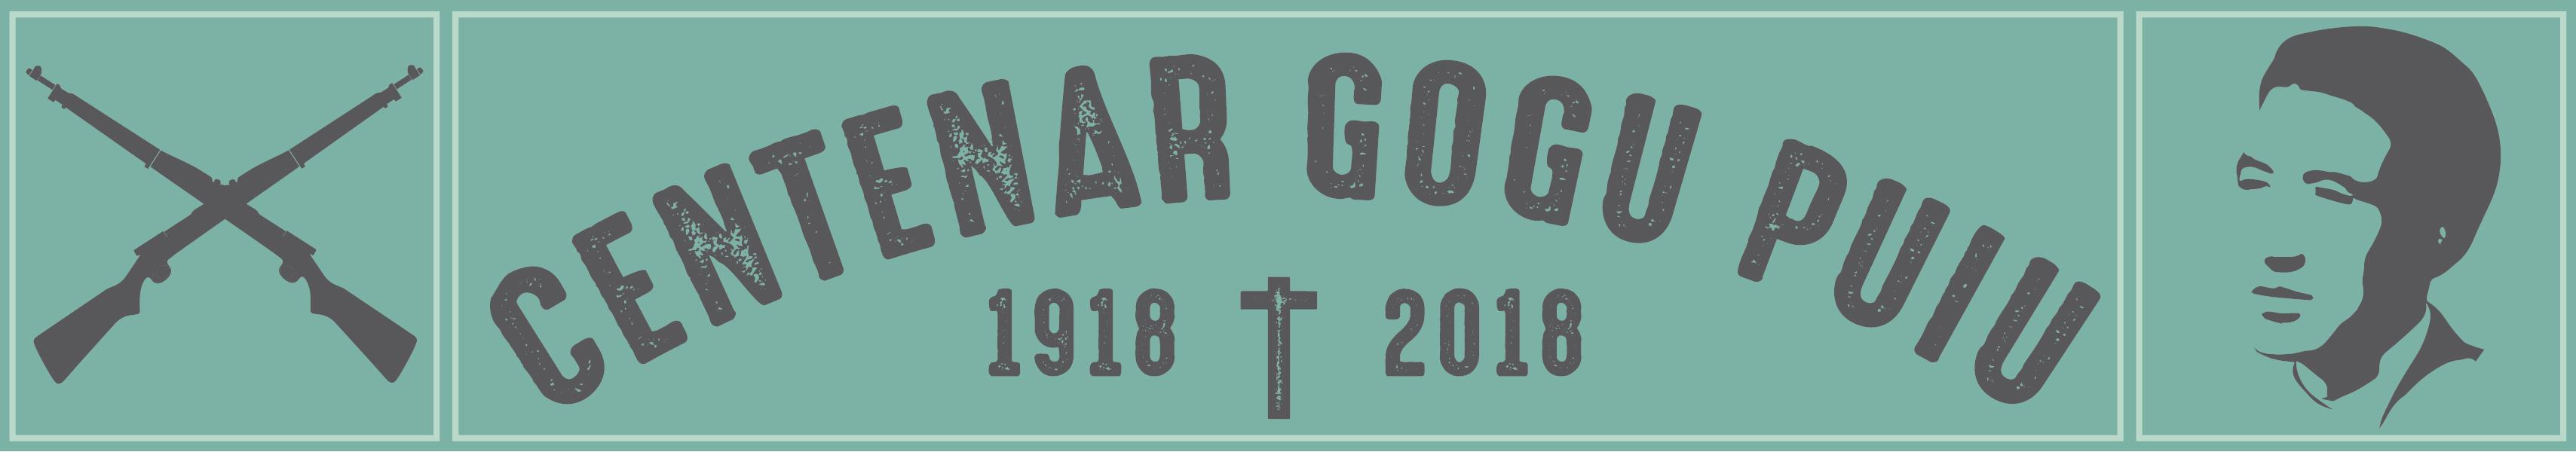 2018 – CENTENAR GOGU PUIU